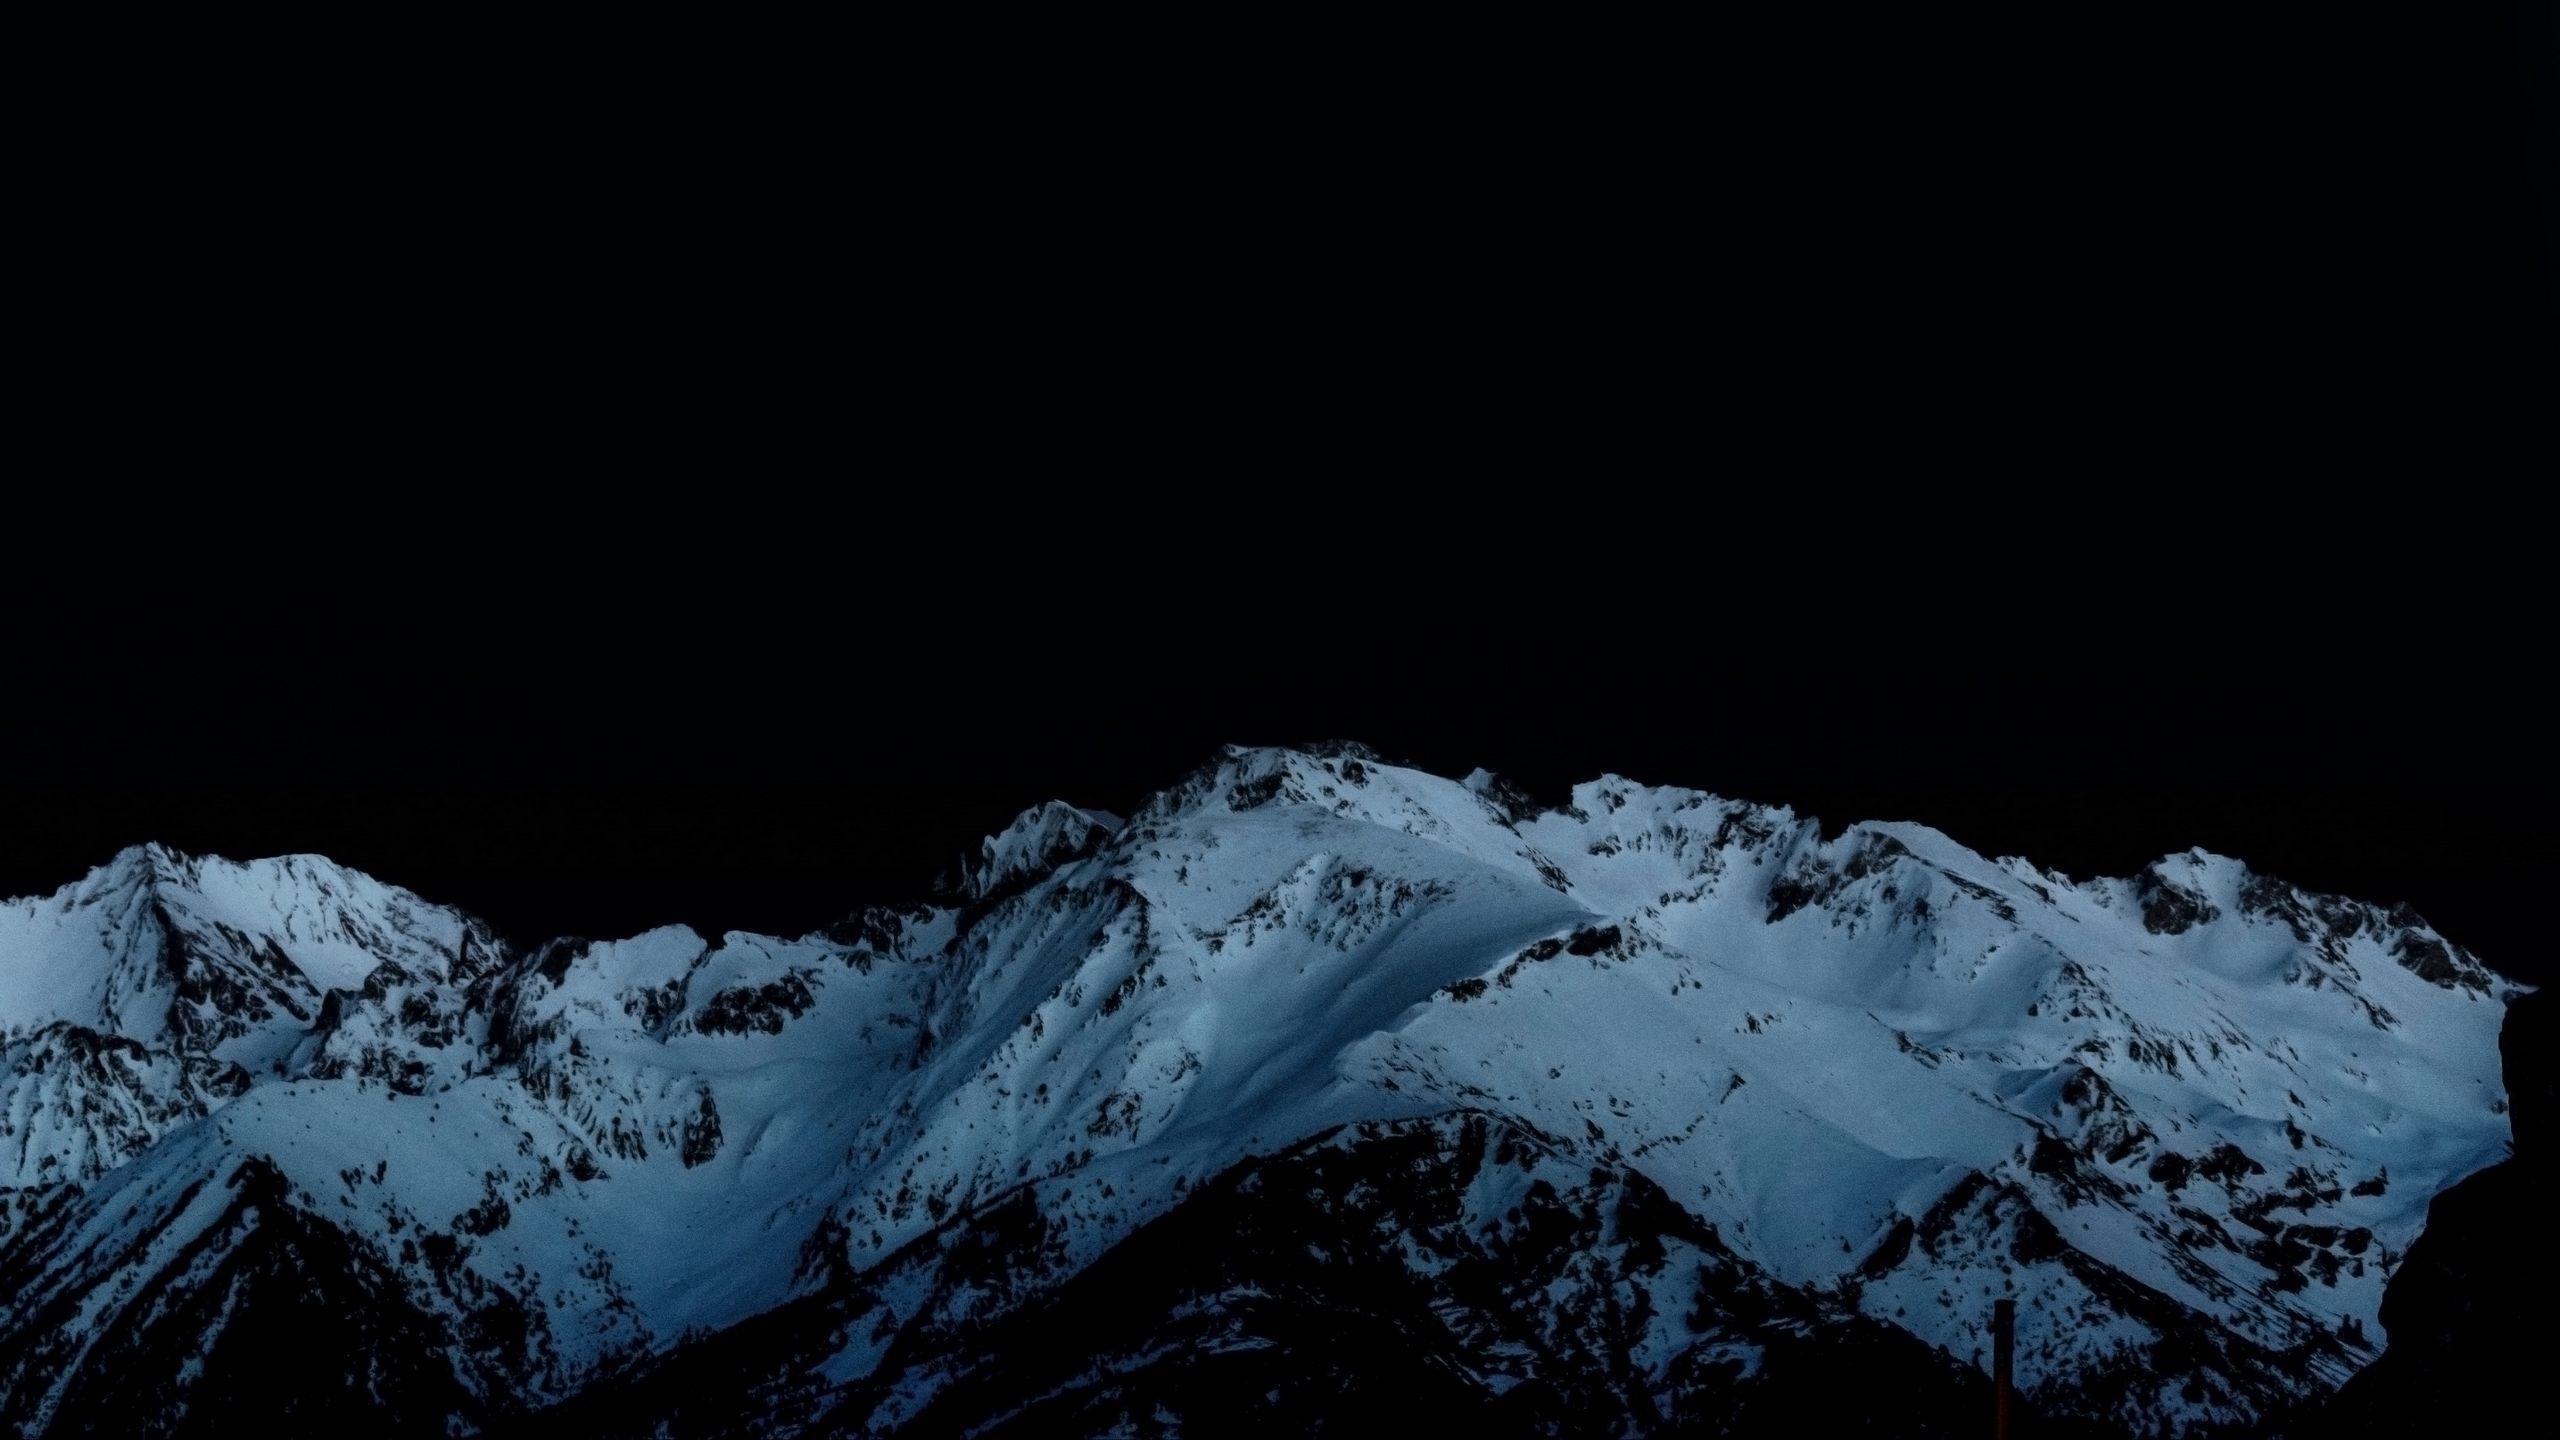 2560x1440 Wallpaper night, mountains, snowy, peaks